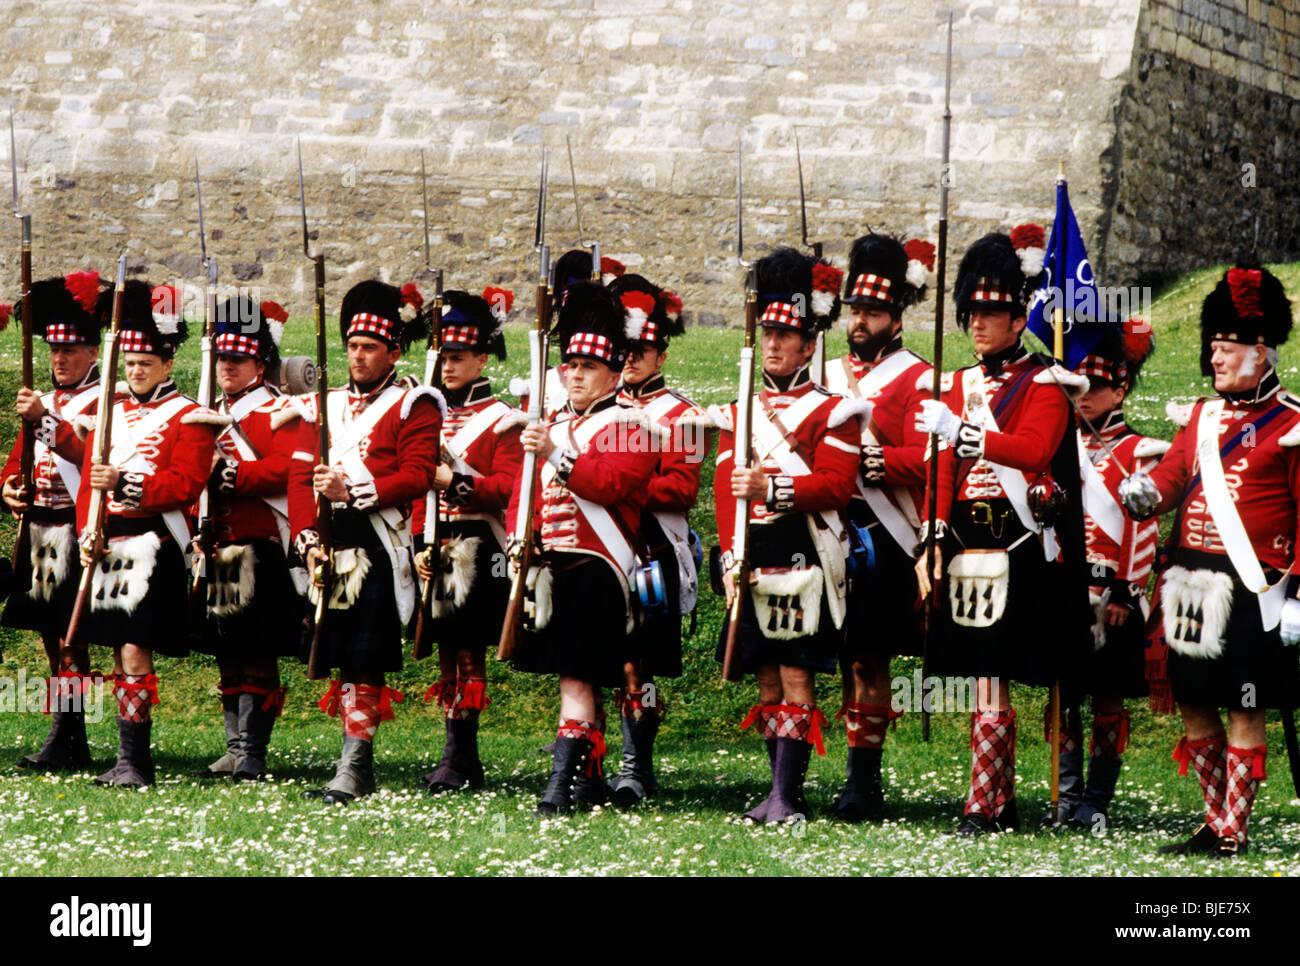 42nd Royal Highland Regiment, 1815 Scottish English British historical re-enactment Napoleonic period foot infantry - Stock Image